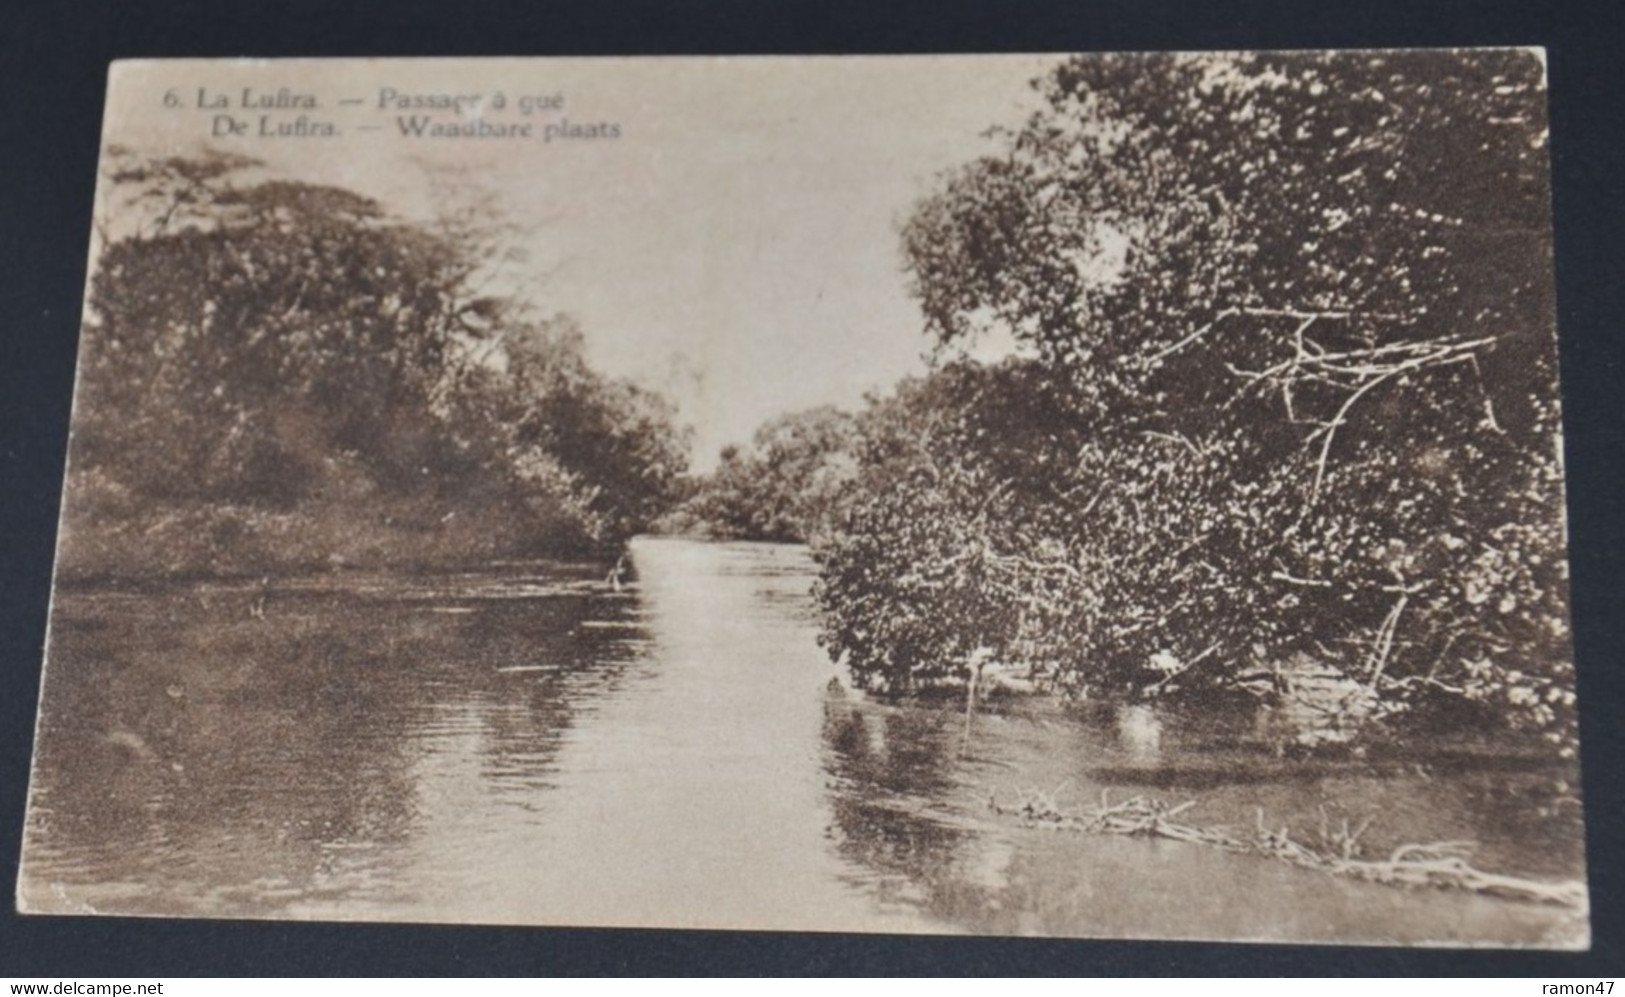 La Lufira - Passage à Gué - Belgisch-Congo - Varia